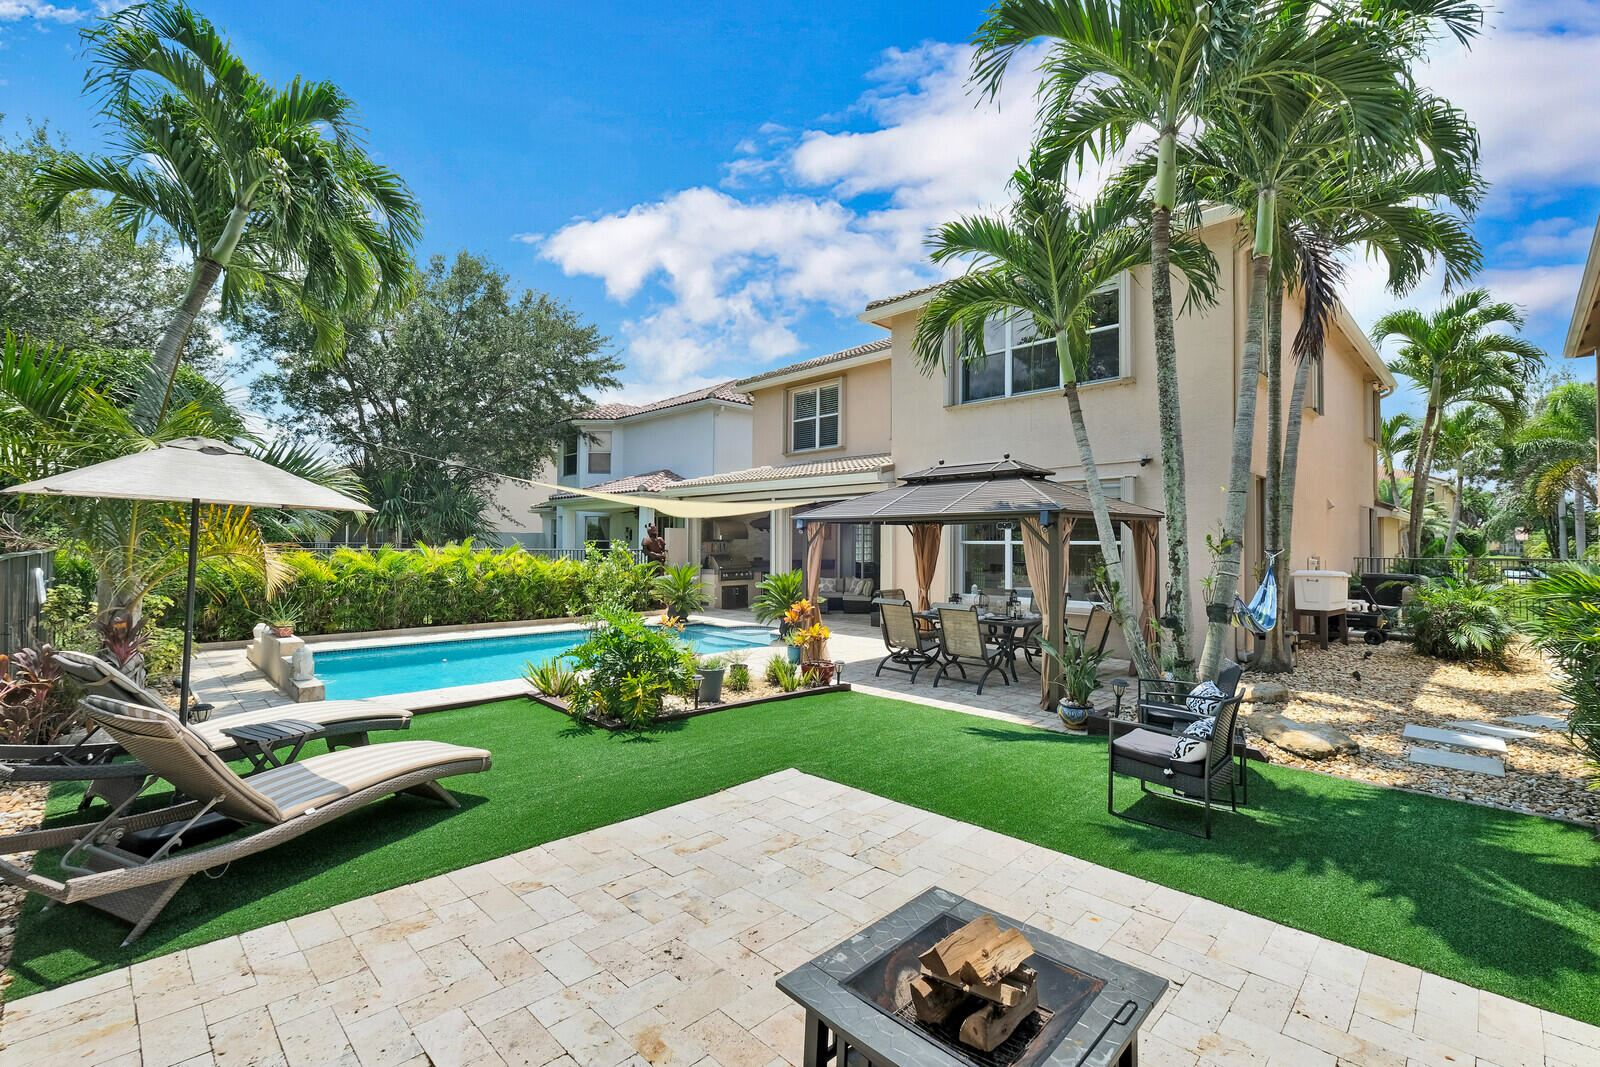 8619 Woodgrove Harbor Lane, Boynton Beach, FL 33473 - MLS#: RX-10734545